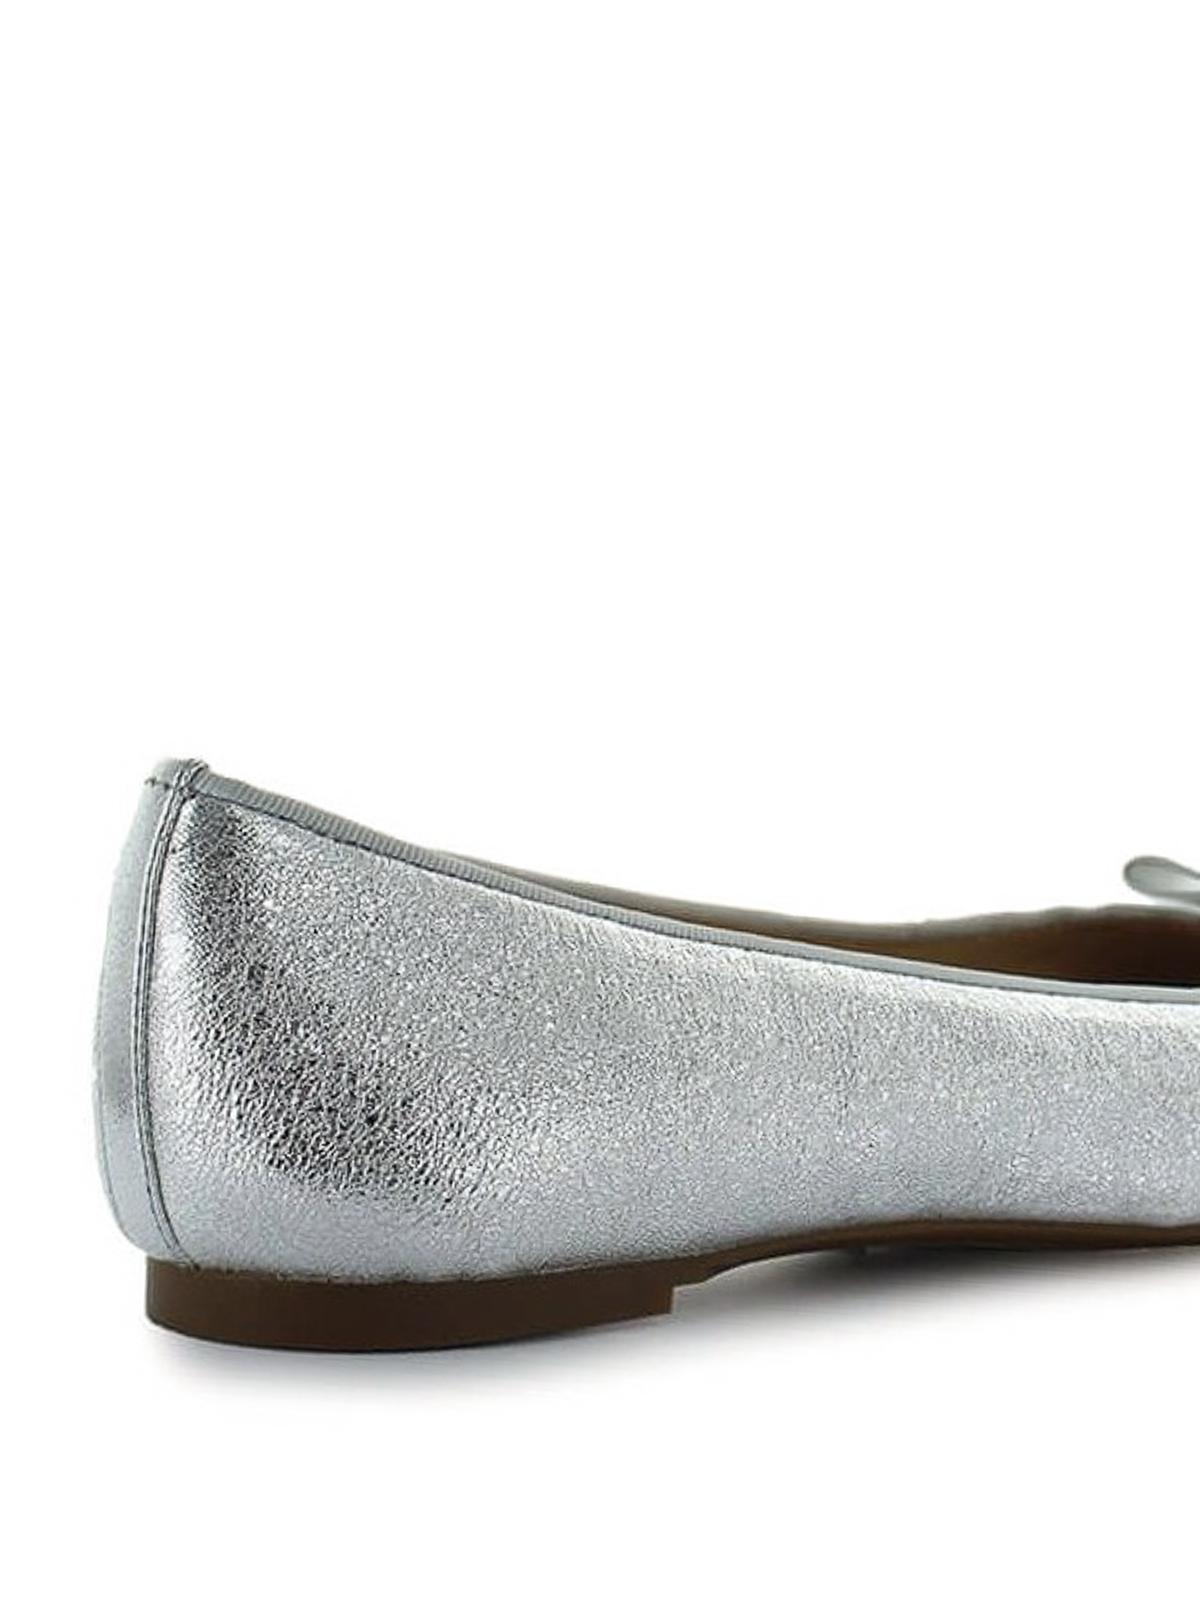 f41a183c90f9 Michael Kors - Alice silver napa ballerinas - flat shoes - 40S8ALFP1M040